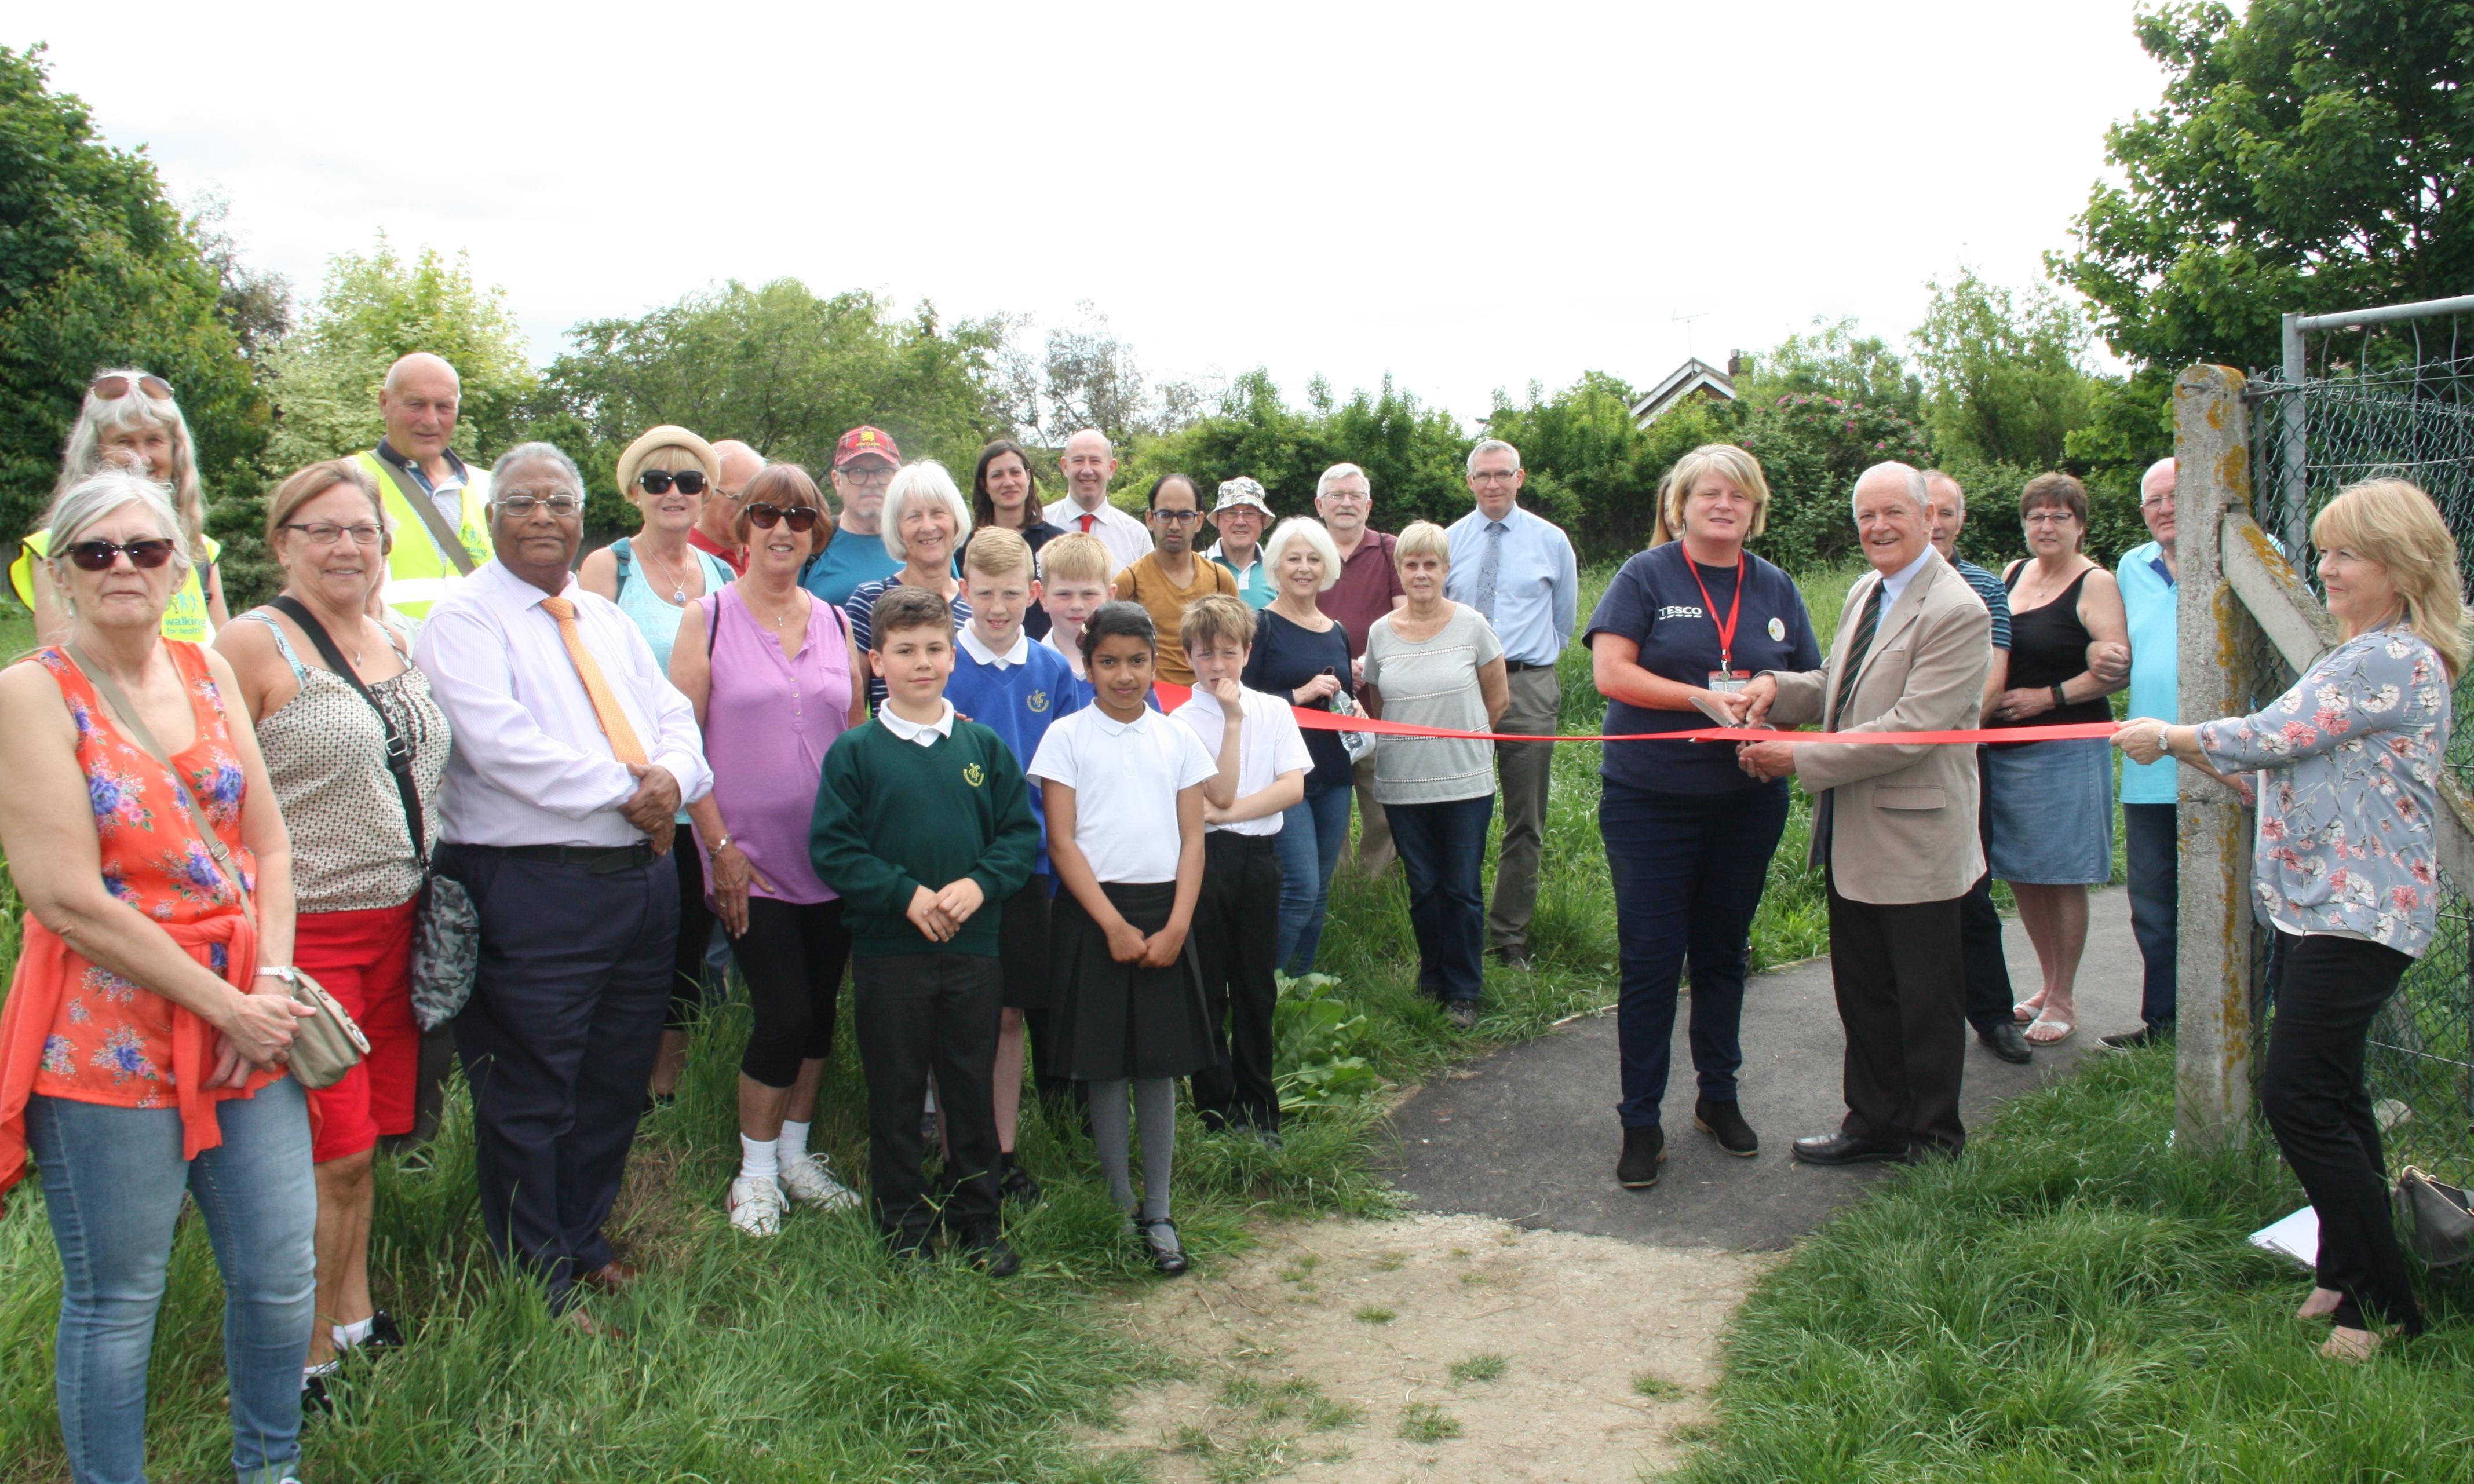 Footpath work helps pupils get to school